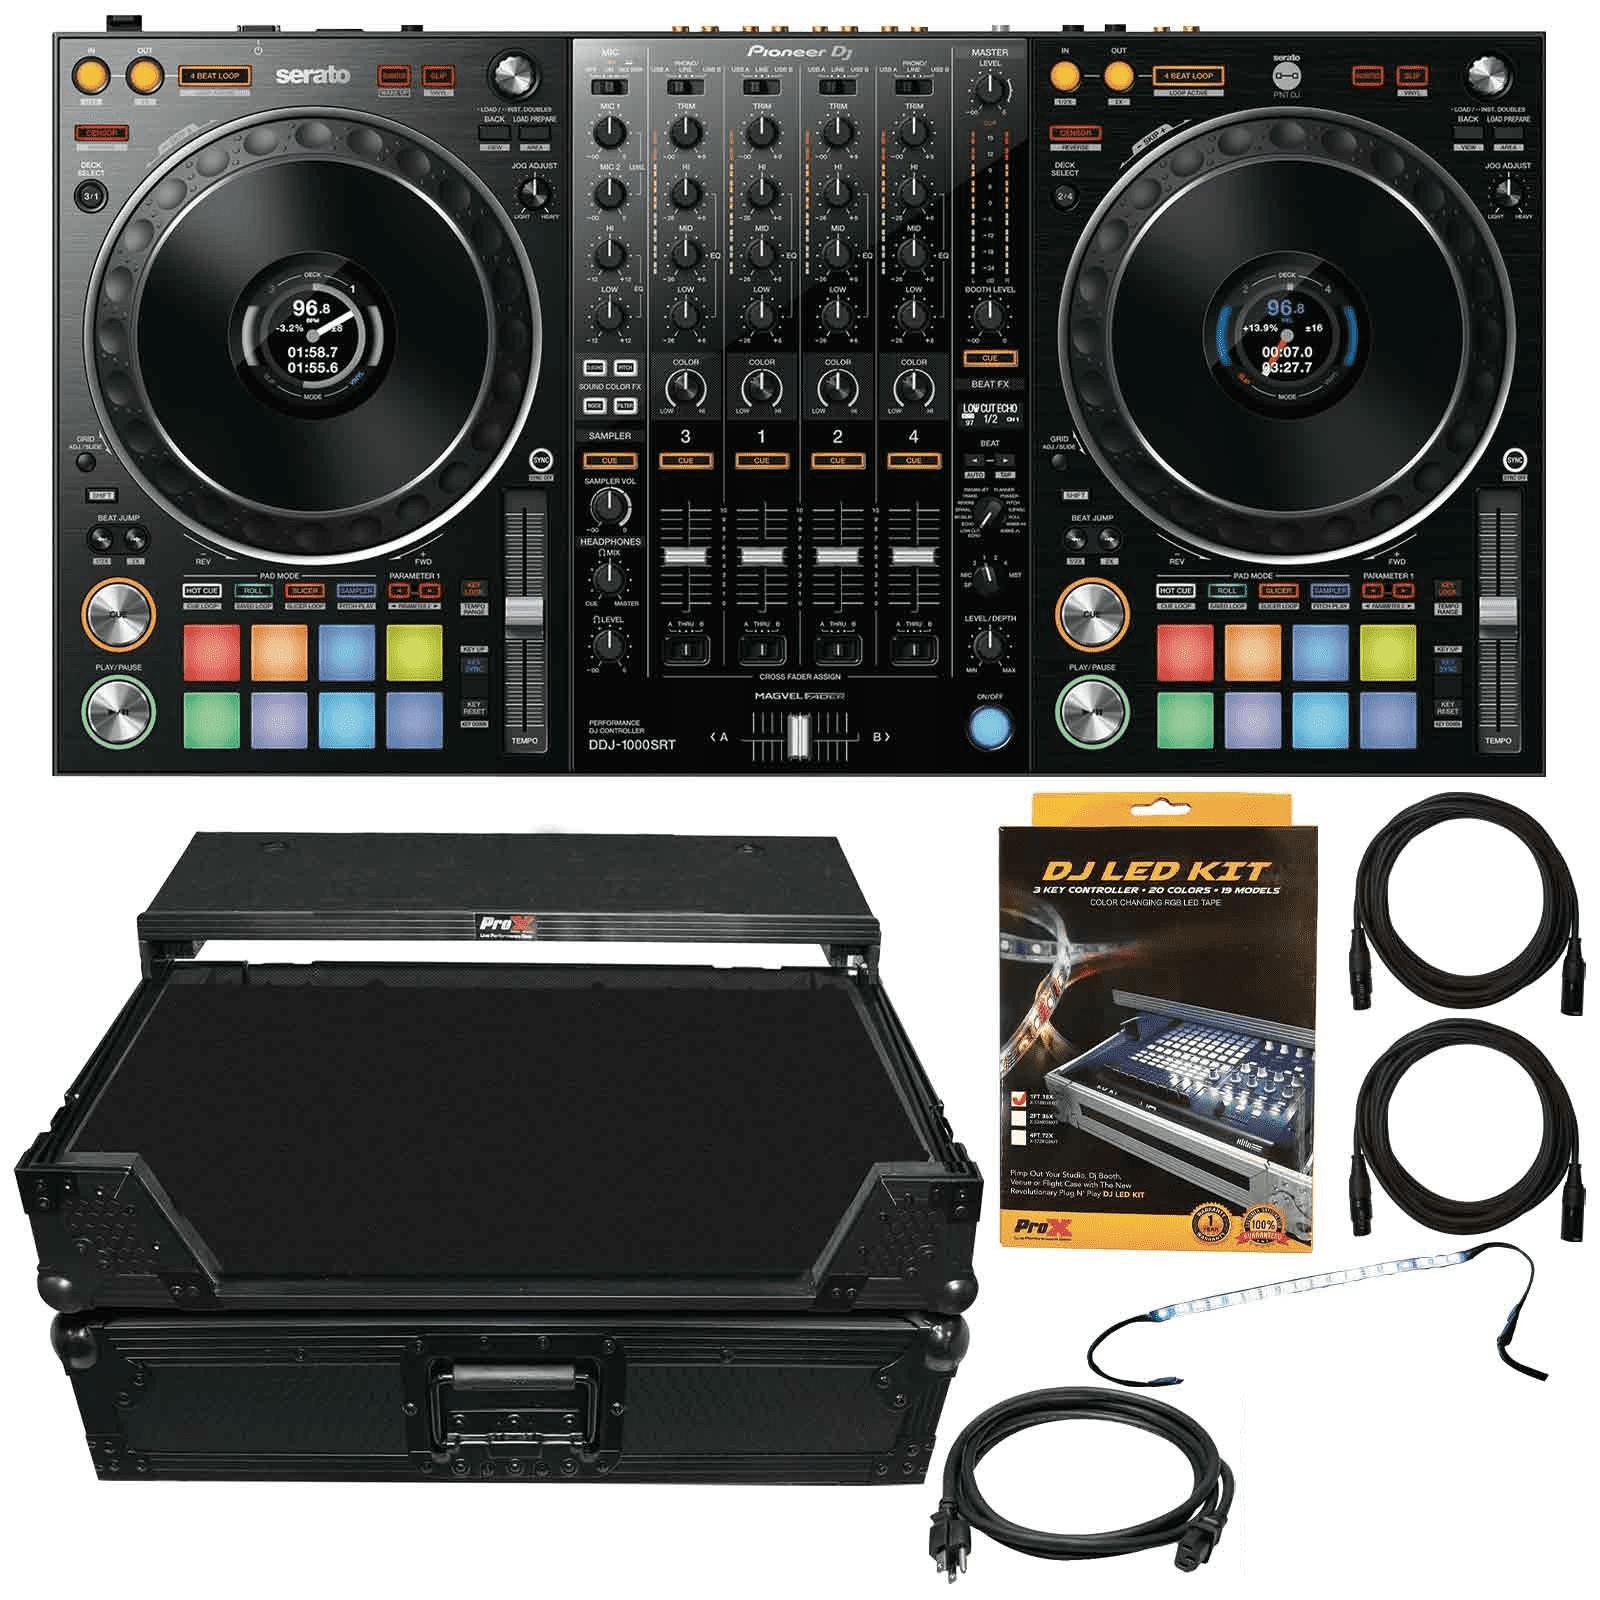 pioneer-dj-ddj-1000srt-4-channel-serato-controller-with-led-strip-light-kit-black-flight-case-package-0fc